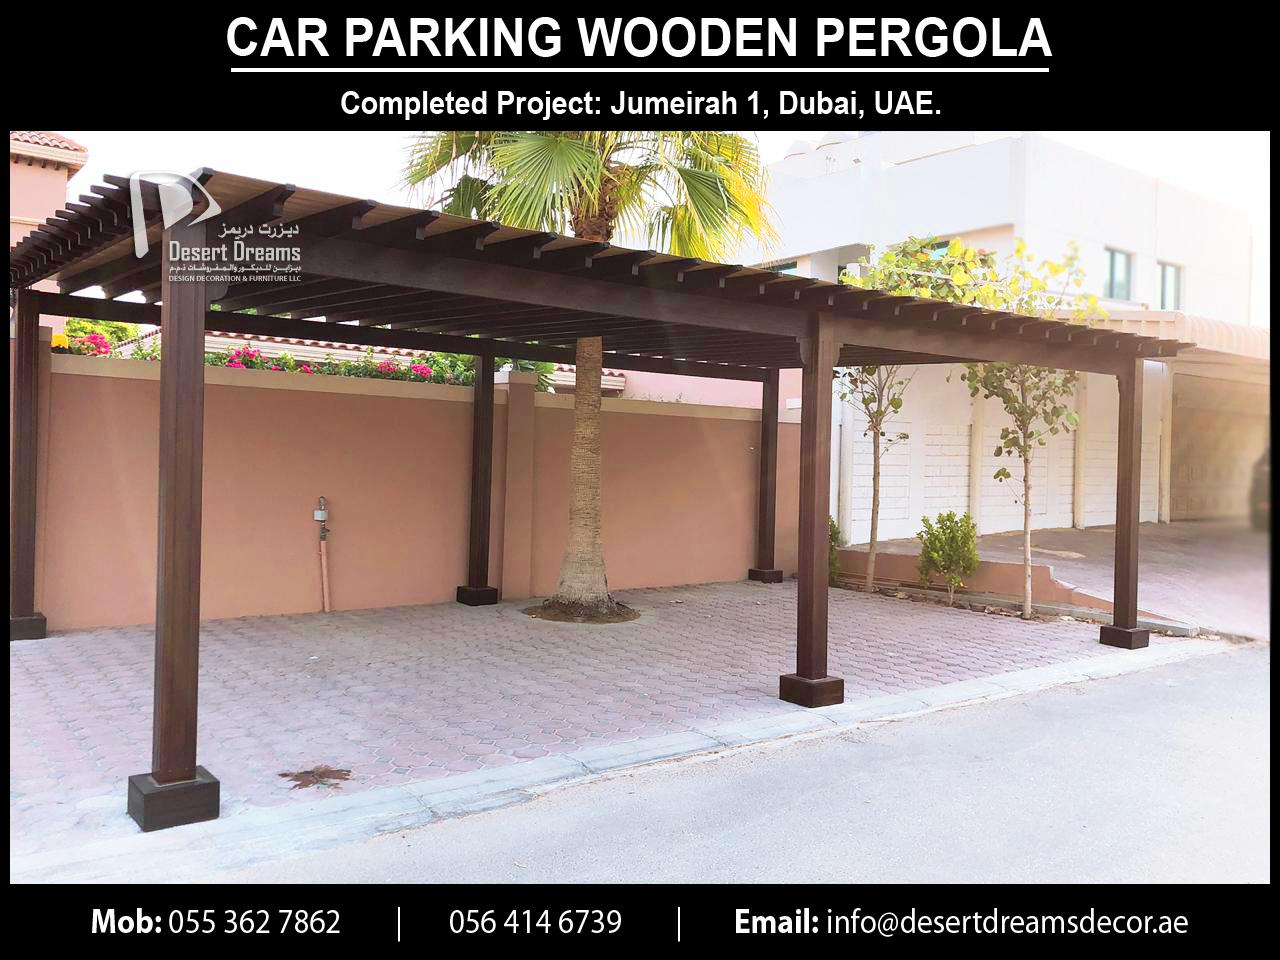 Car Parking Wooden Pergola UAE_Pergola Images_Desert Dreams (4).jpg